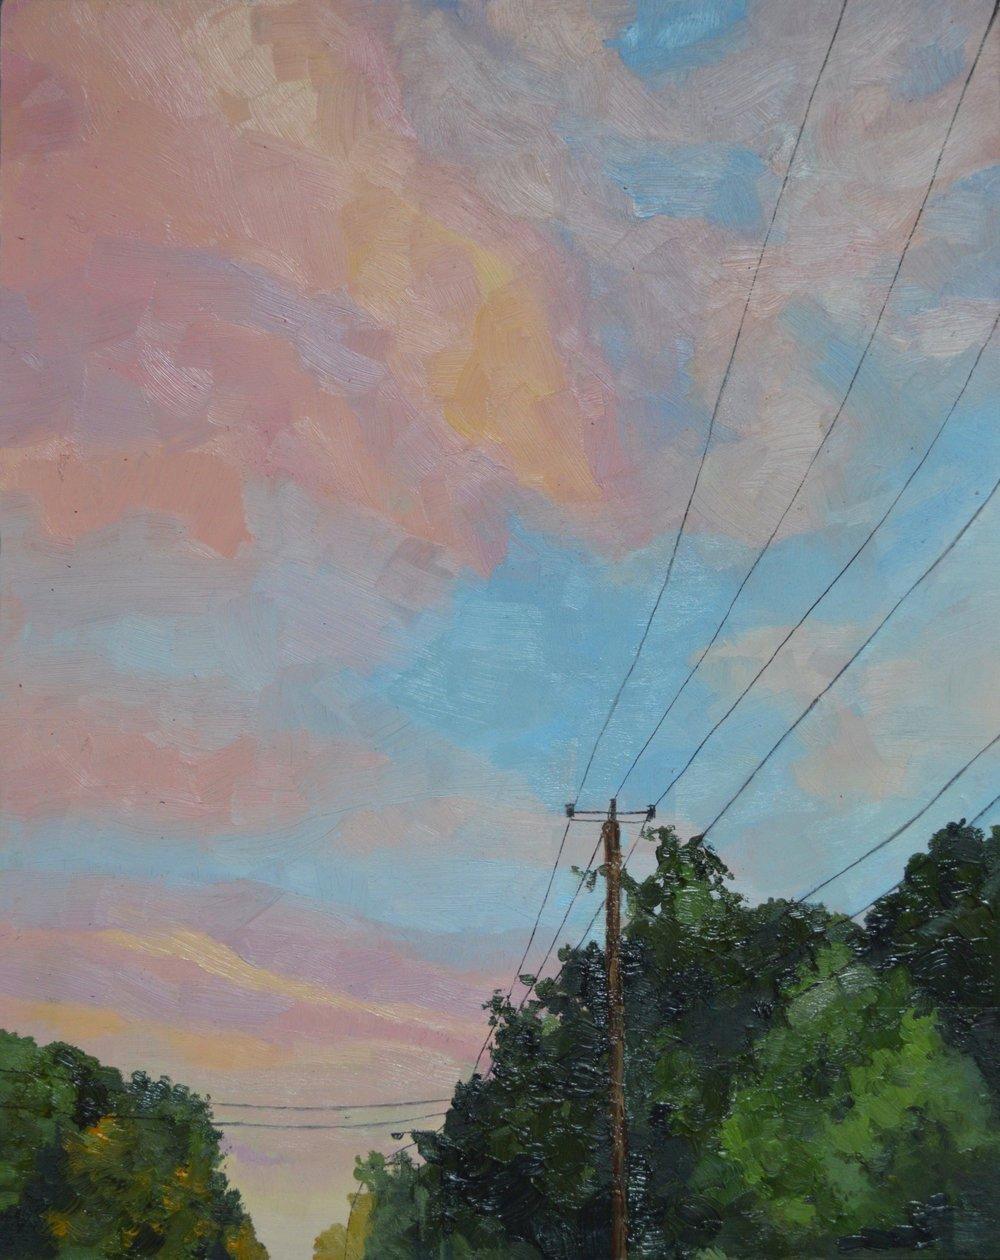 "En route,  Oil on Wood Panel, 8 x 10"", 2019"